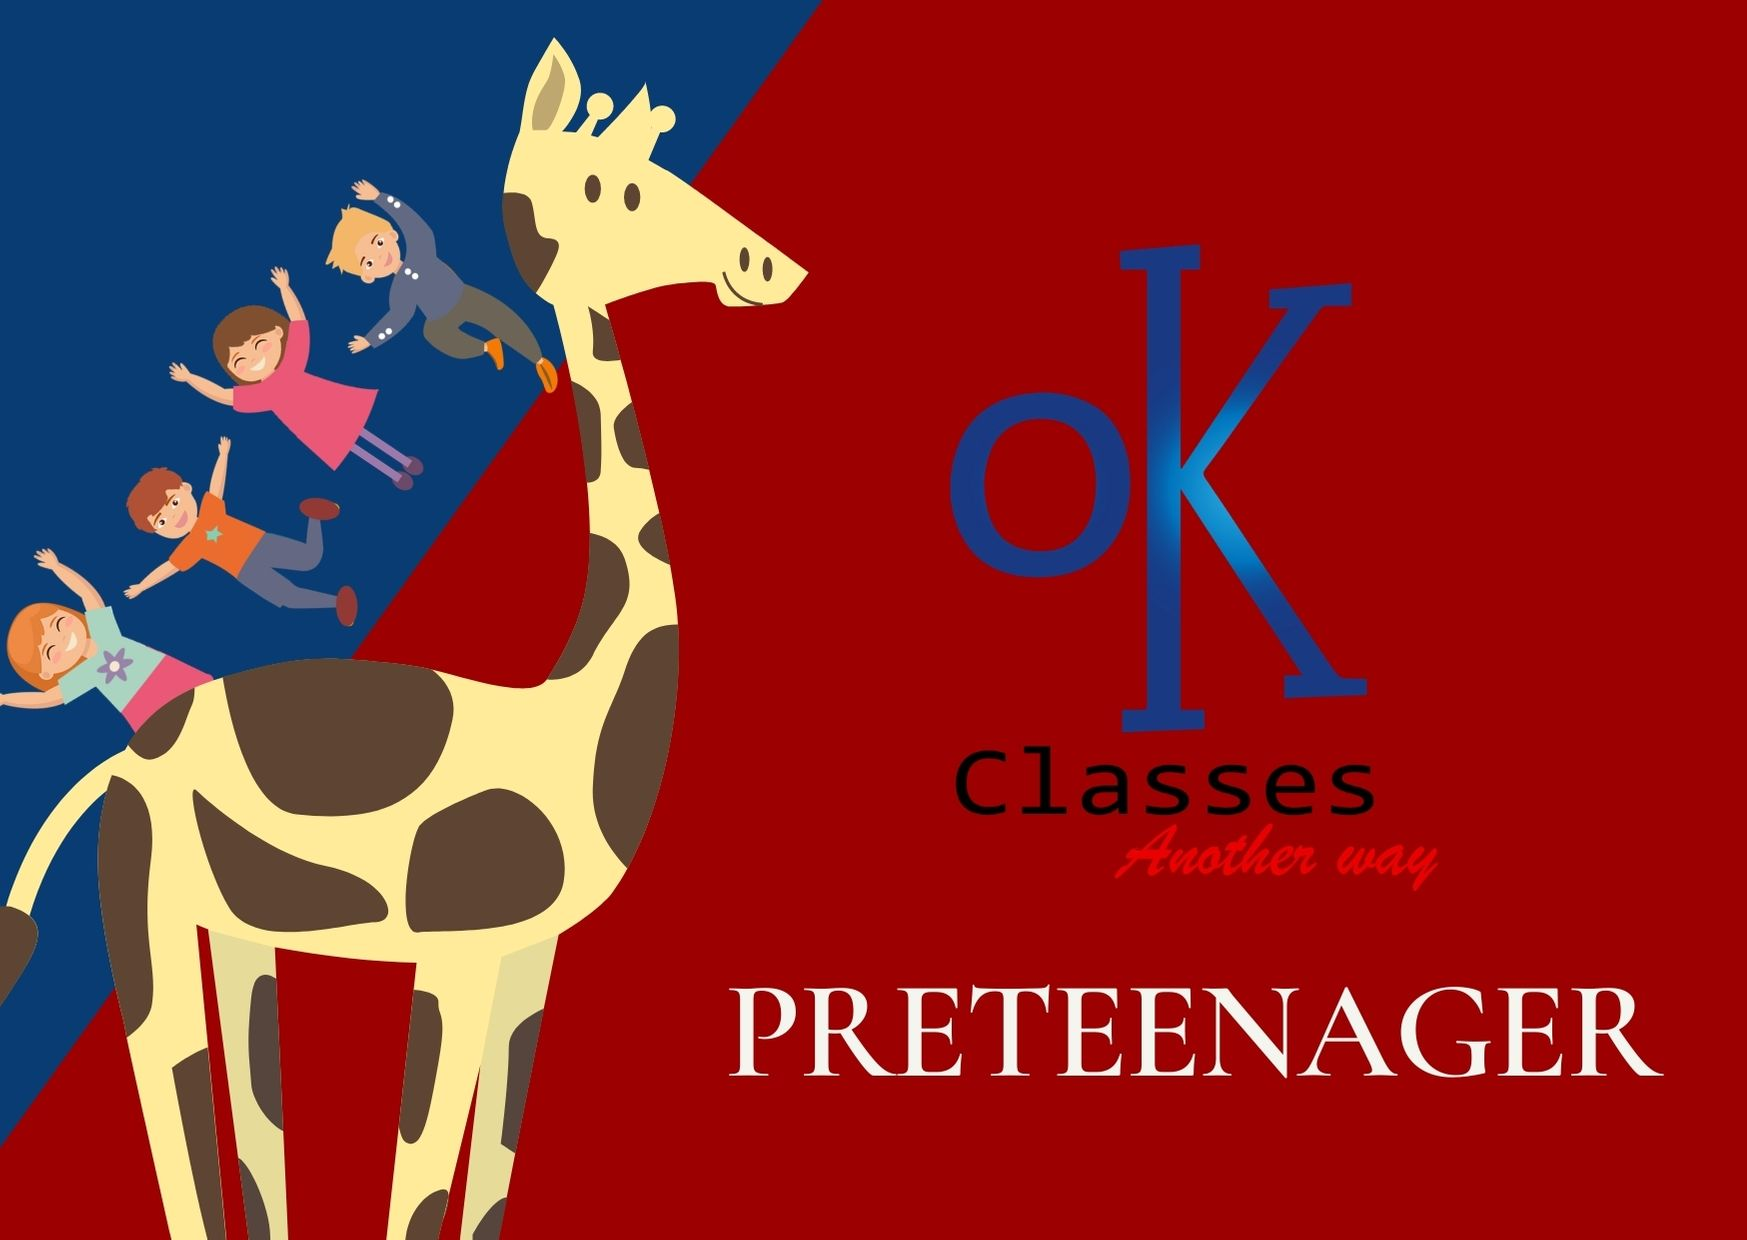 Ok Classes Preteenager